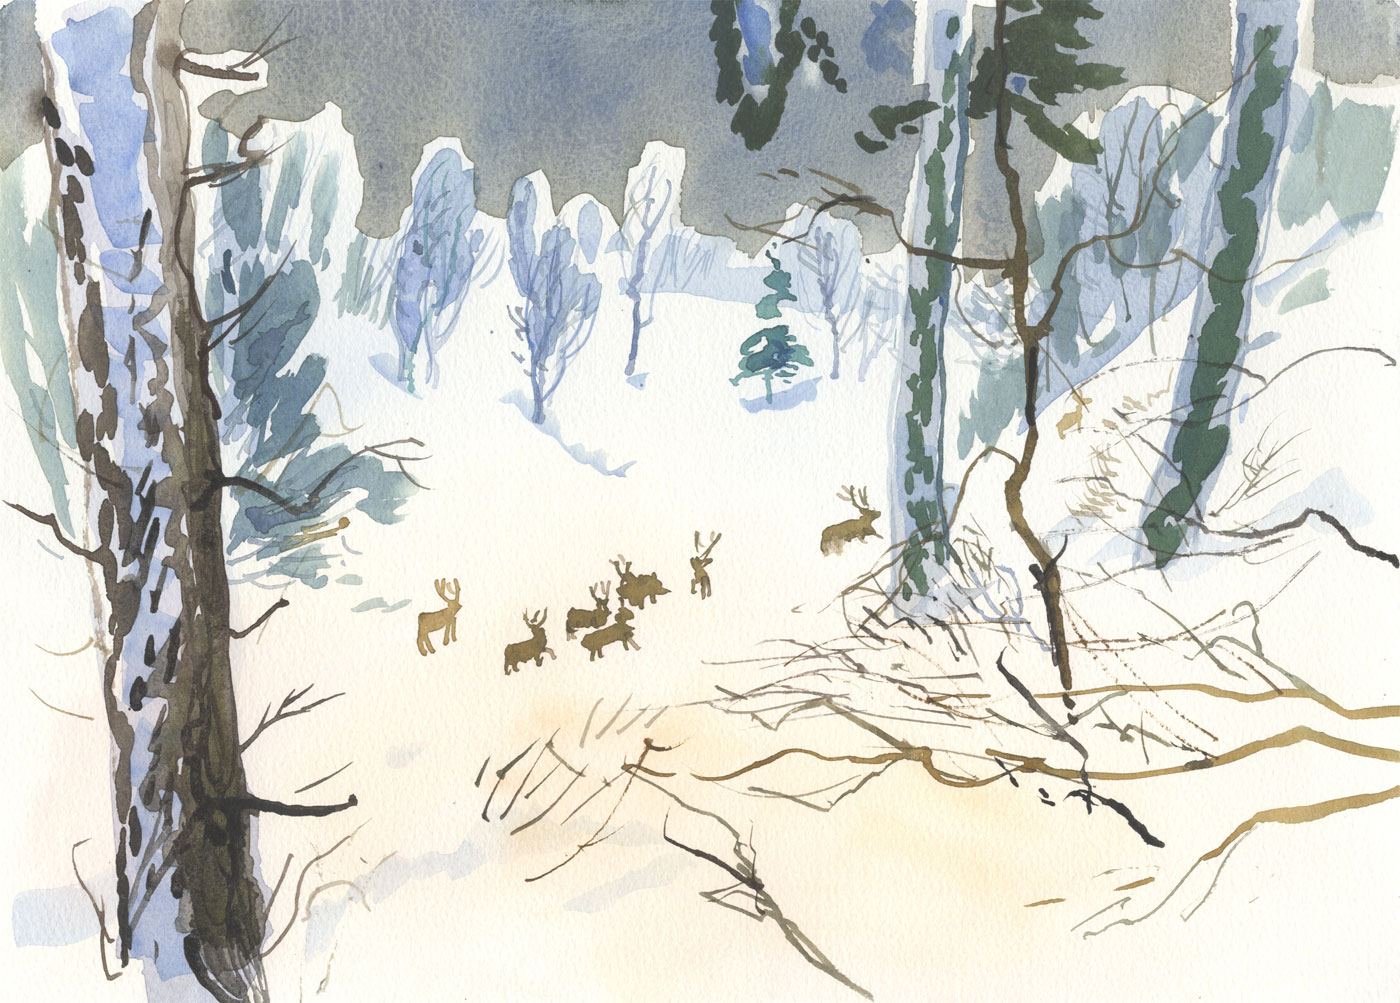 Robert T. Blayney (1929-2016) - Mid 20th Century Watercolour, Winter Landscape